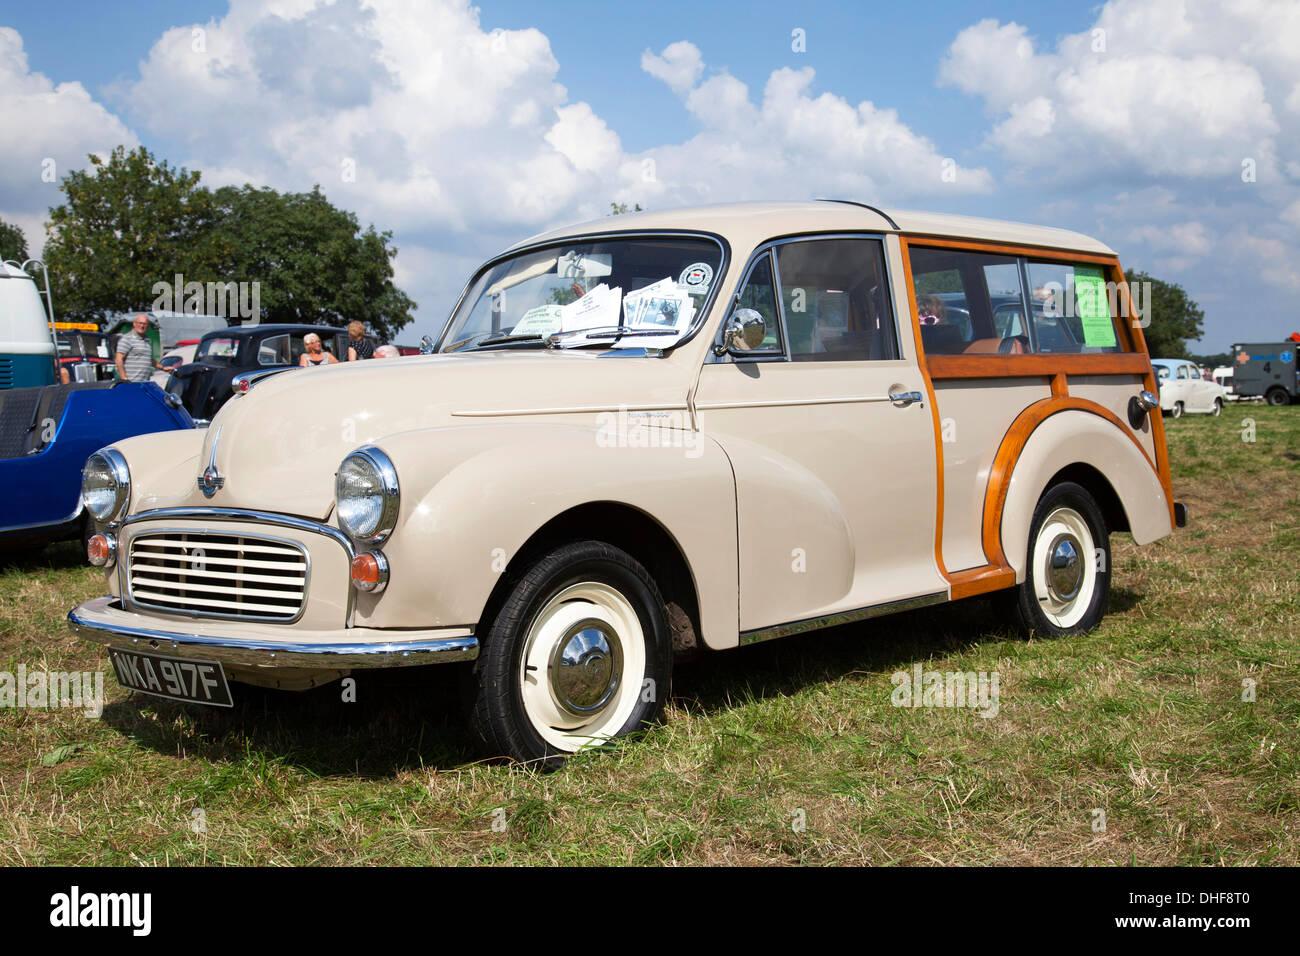 A Morris 1000 Traveller. - Stock Image